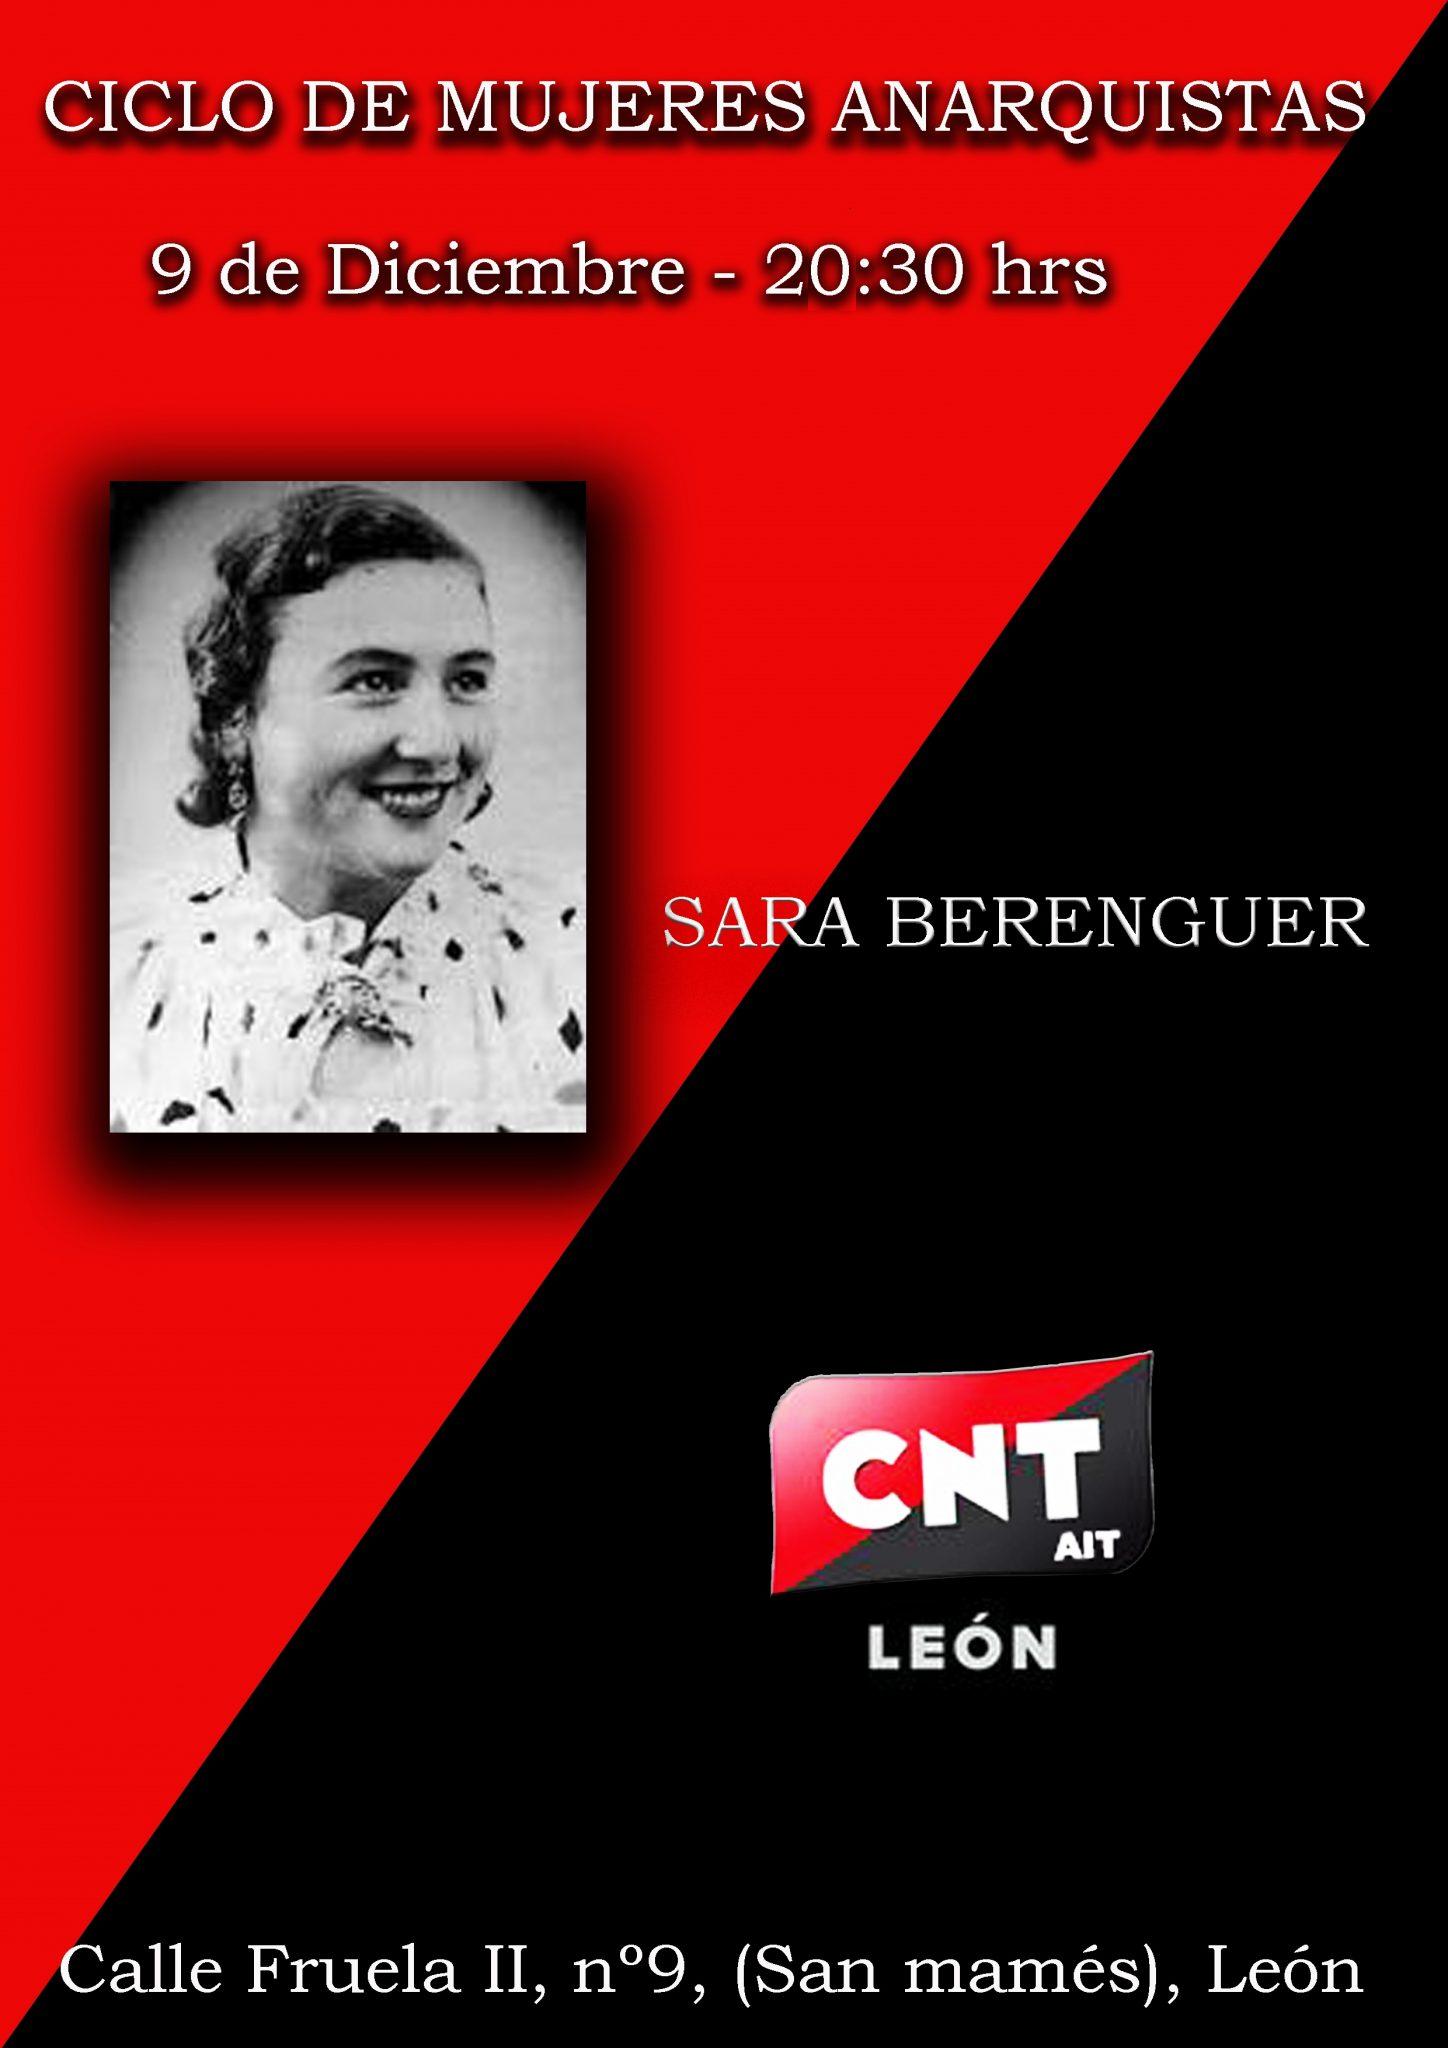 CICLO DE MUJERES ANARQUISTAS – Sara Berenguer